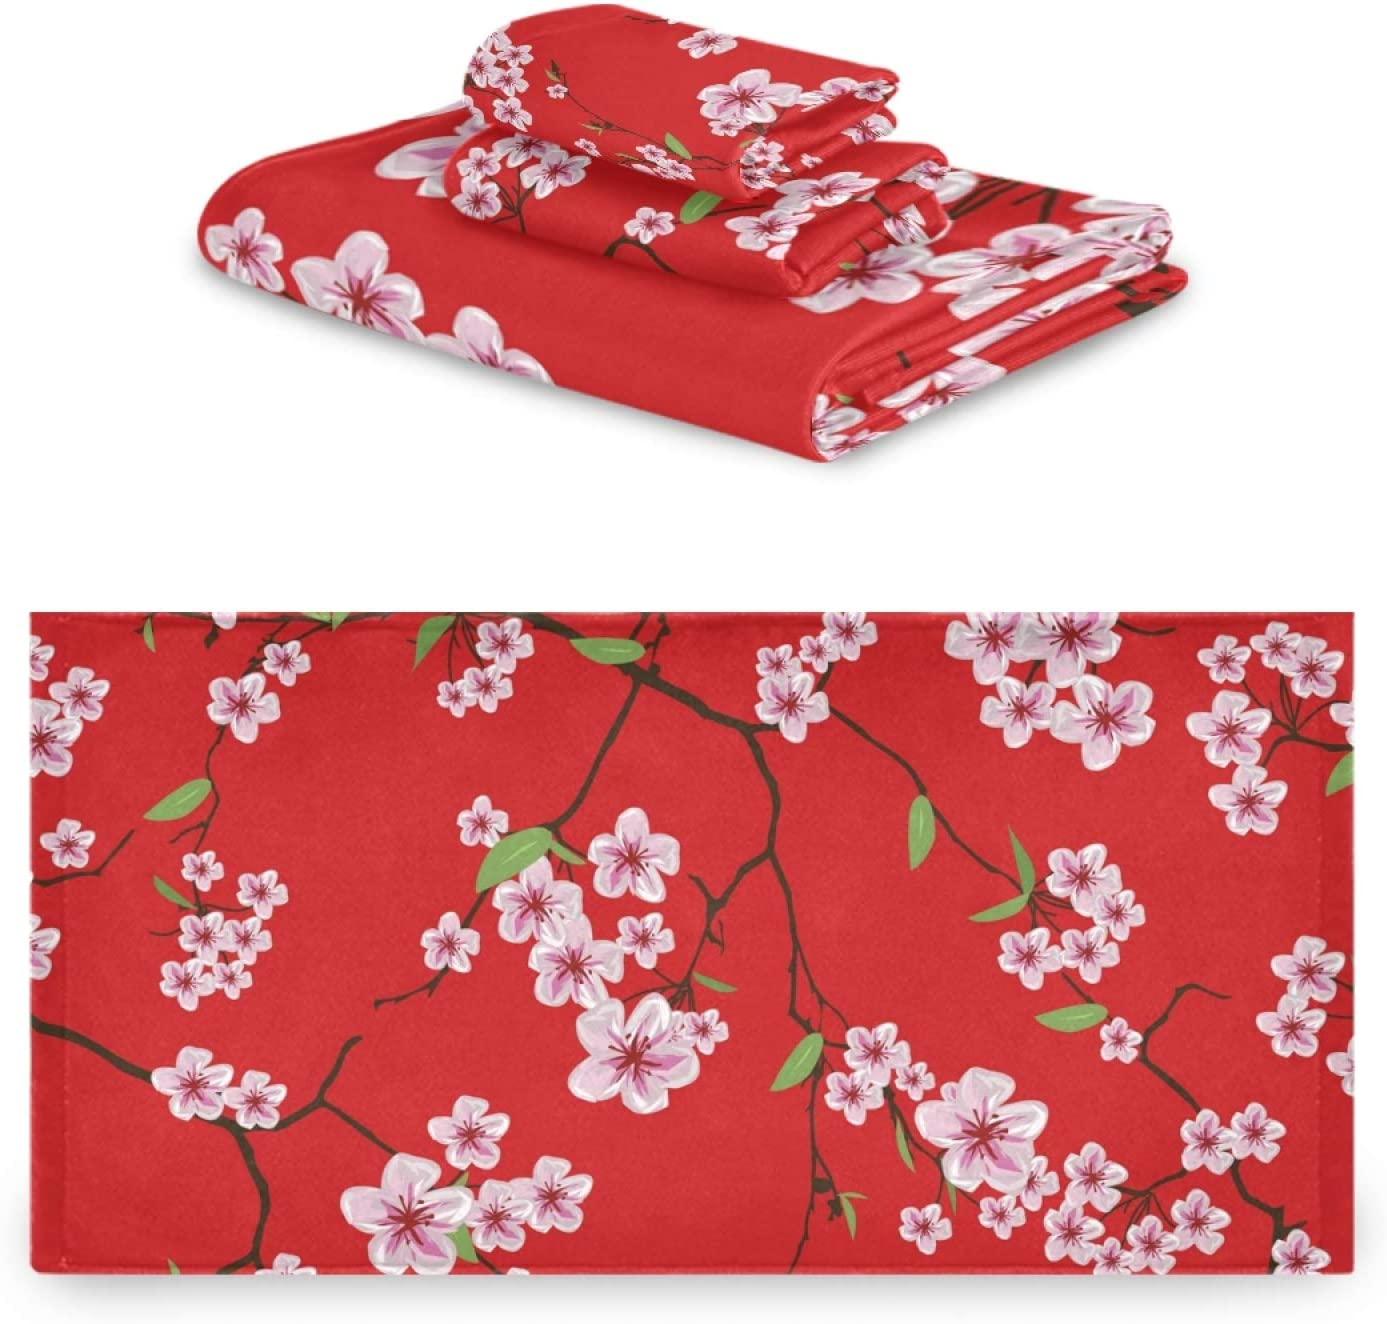 Calmd Towel Max Award-winning store 59% OFF Set 3 Piece Cherry Japanese Soft Bath Blossoms